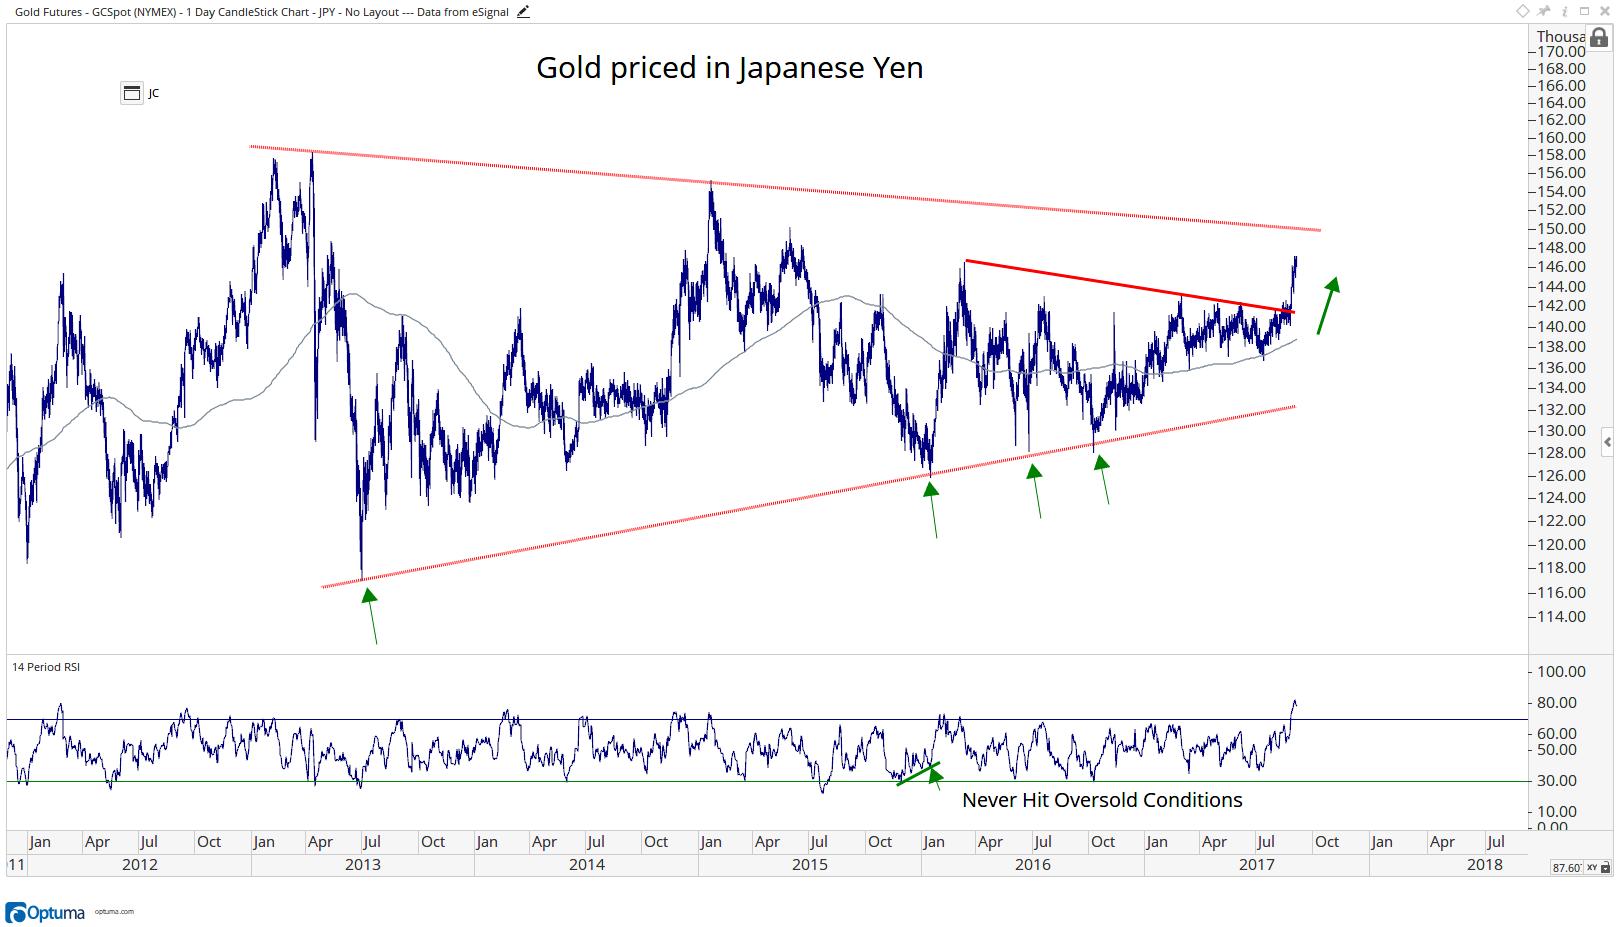 Gold - JPY